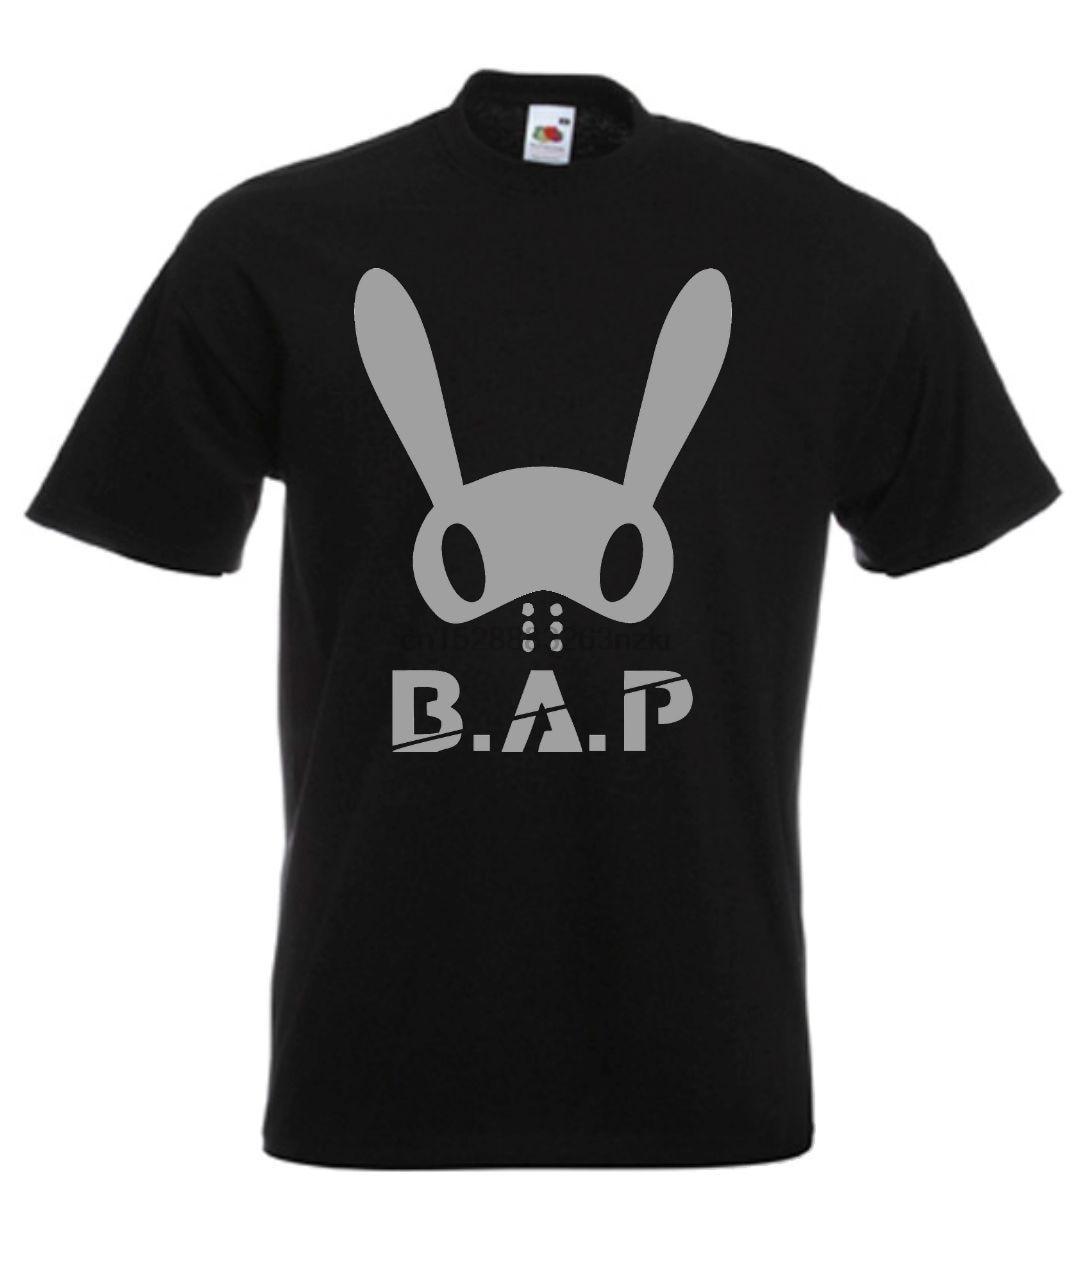 B.A.P BAP Sur Kpop coreano música T camisa 100% recta de algodón o-Cuello de manga corta